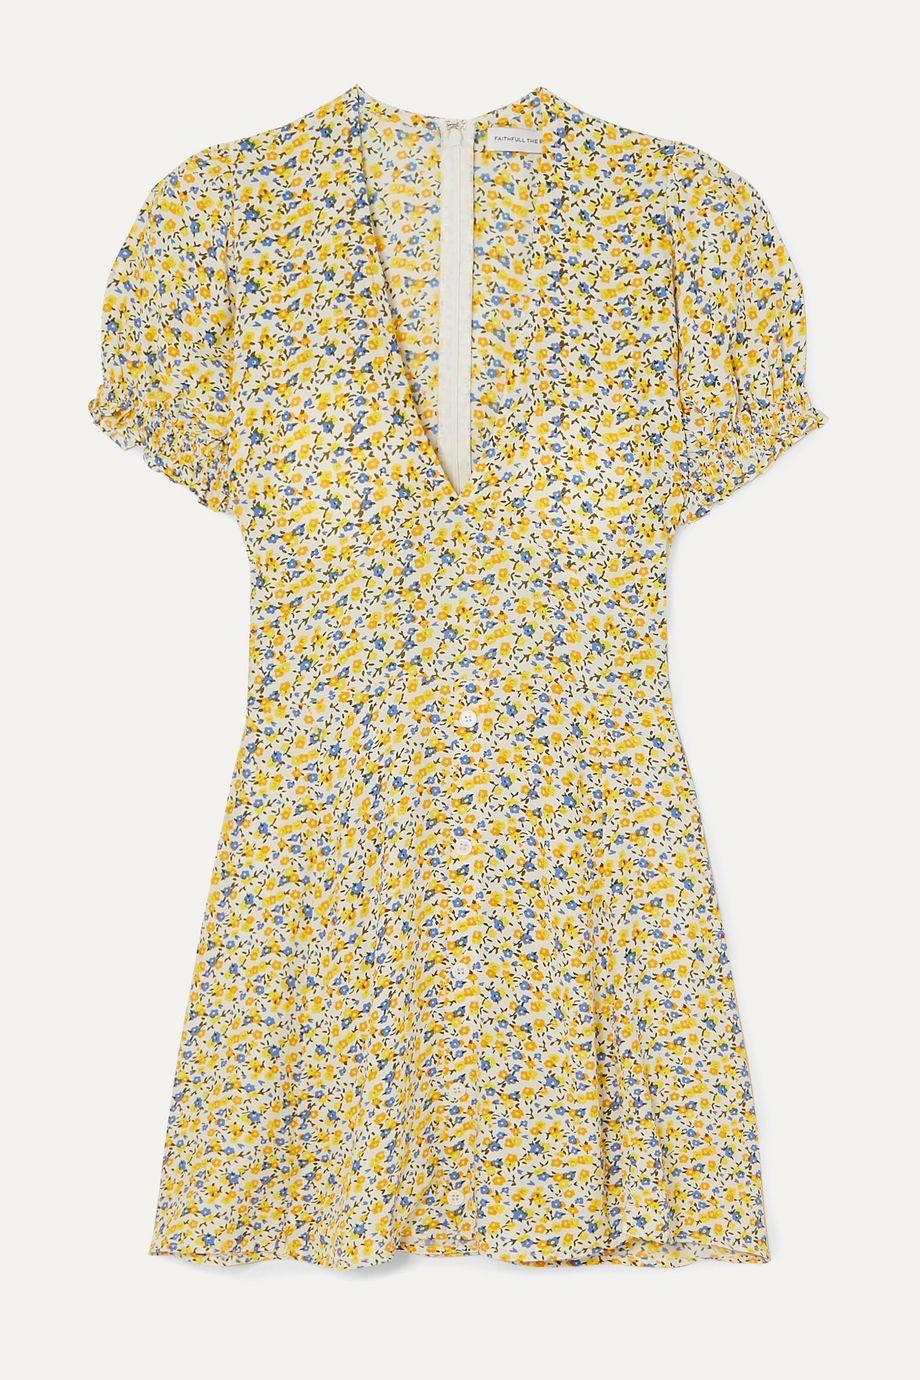 Faithfull The Brand Rafhaela floral-print crepe mini dress